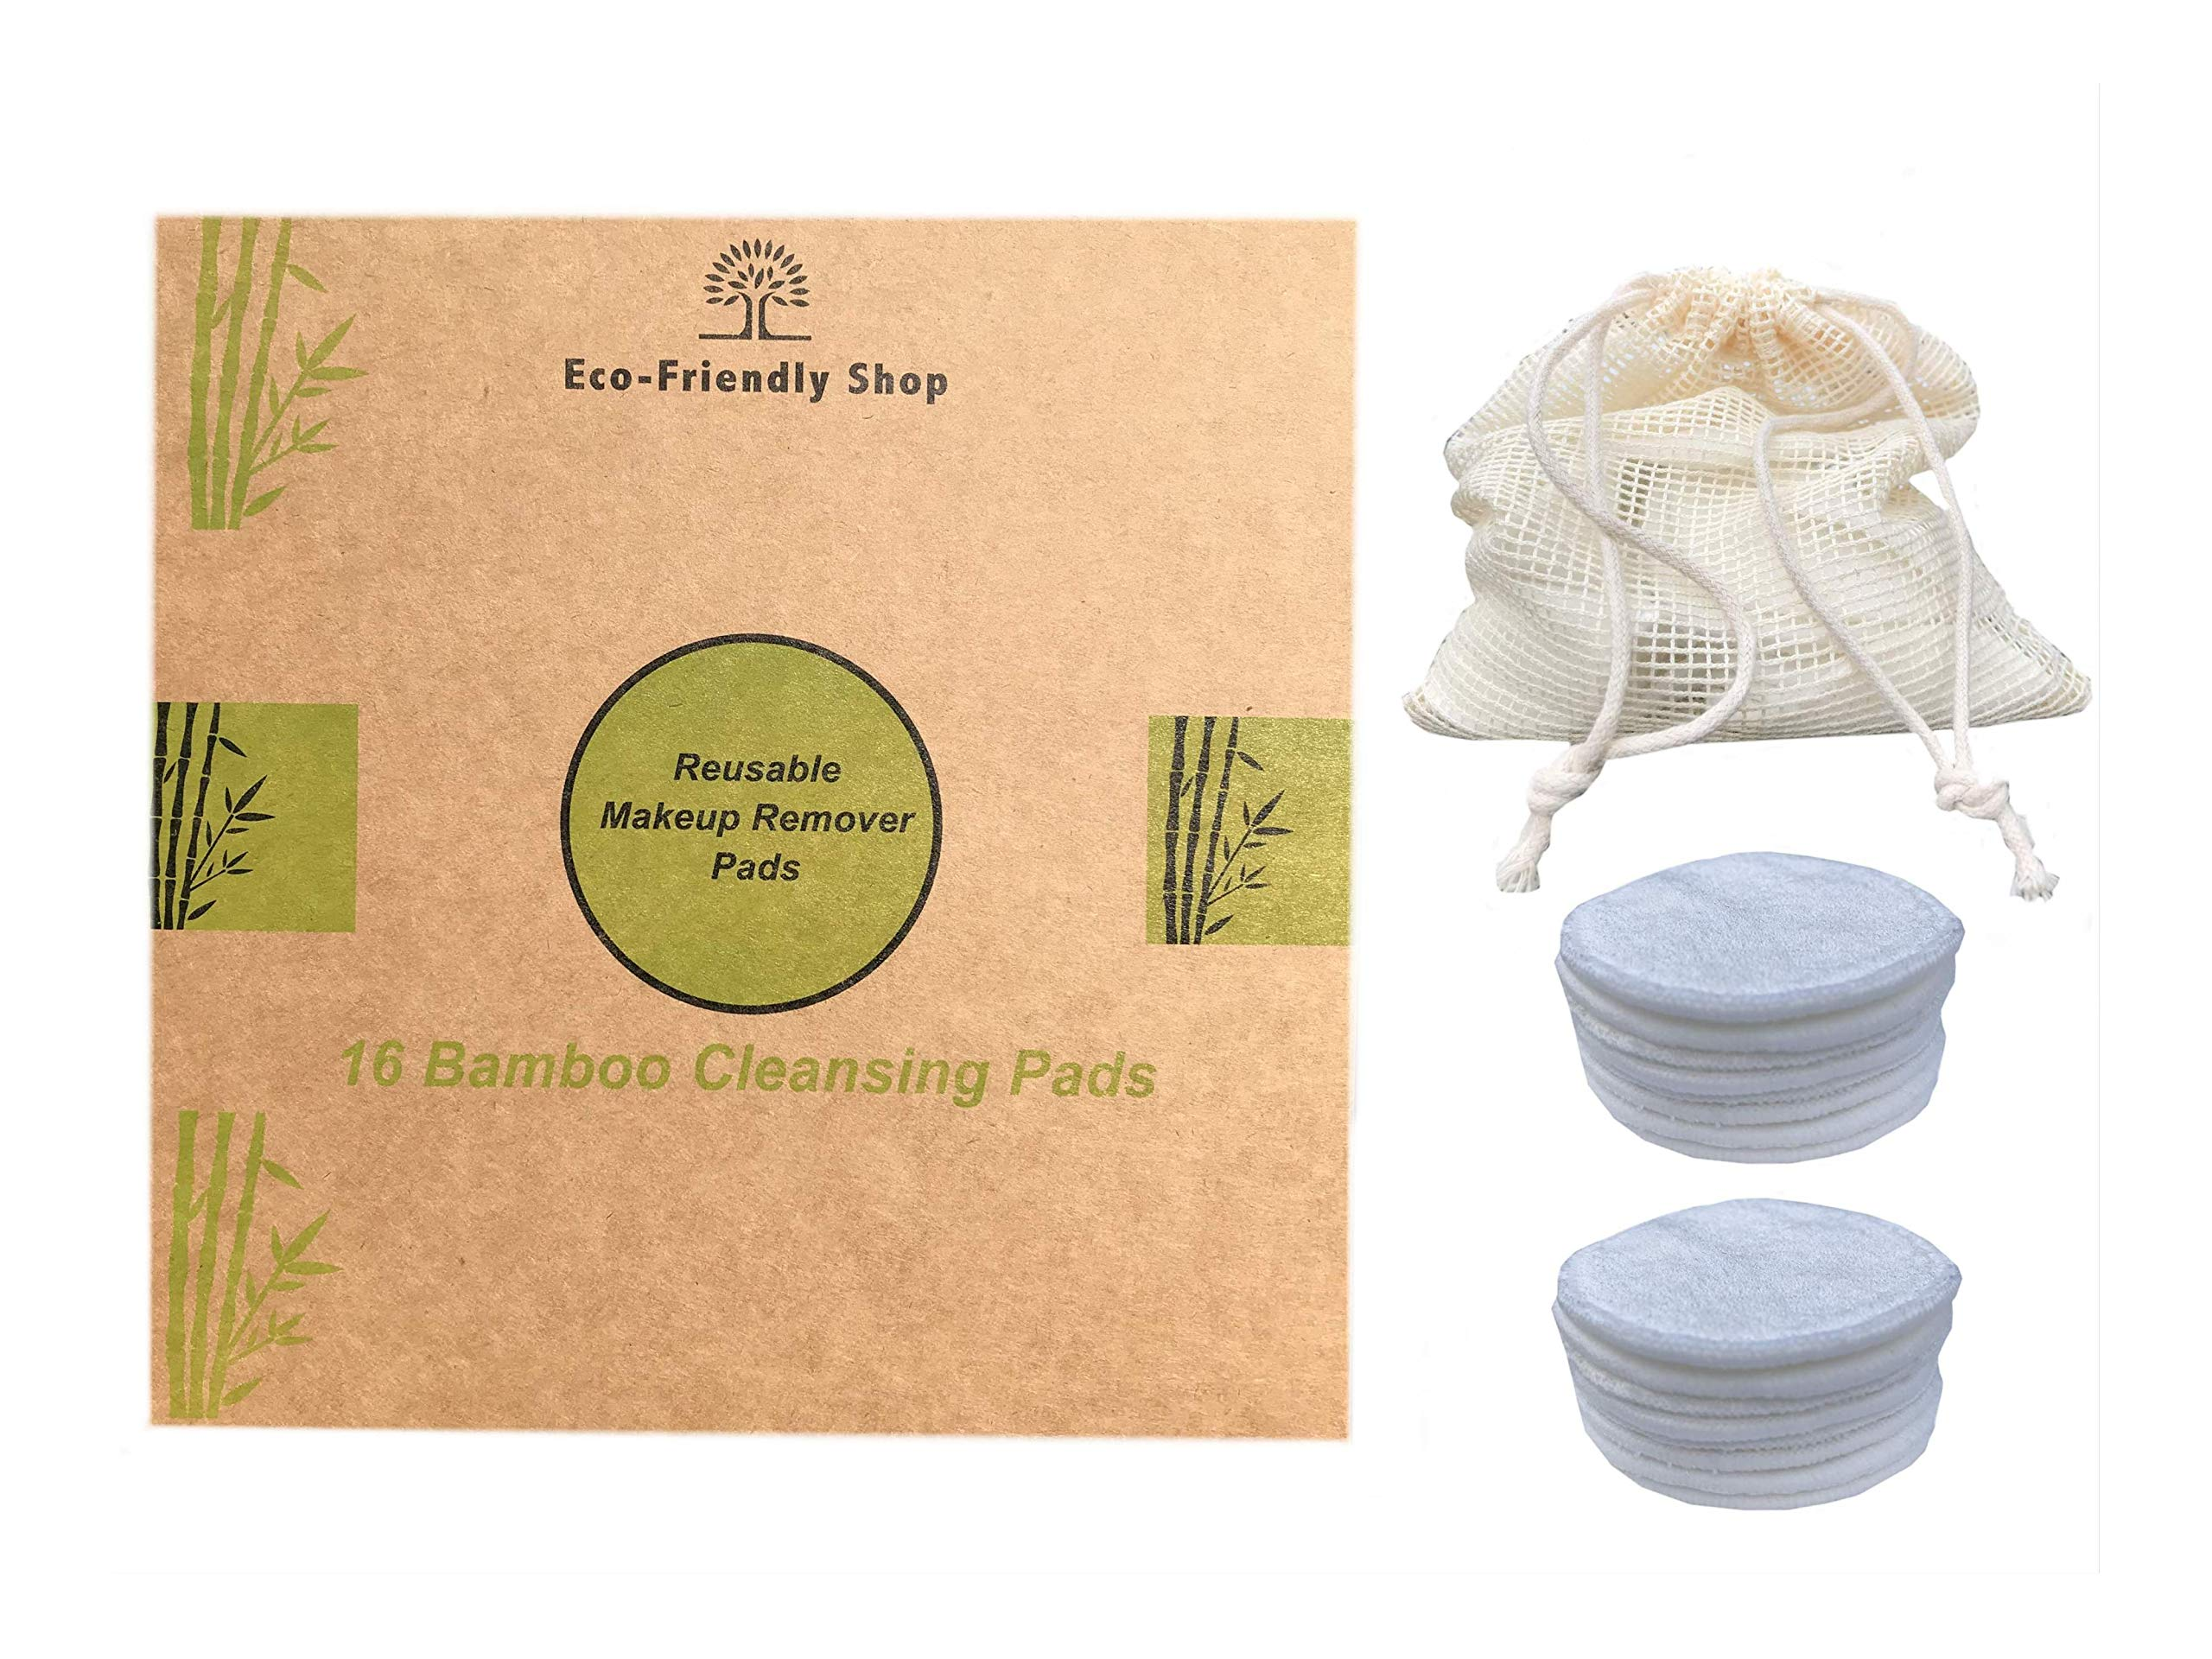 Reusable Remover Pads丨Bamboo Fiber Cleansing Pads丨Washable Cotton Wipe丨Organic Makeup Disc丨Facial Cleansing Disks + 1 Laundry Bag 1 Makeup Sponge丨Biodegradable Packaging Box 16pcs